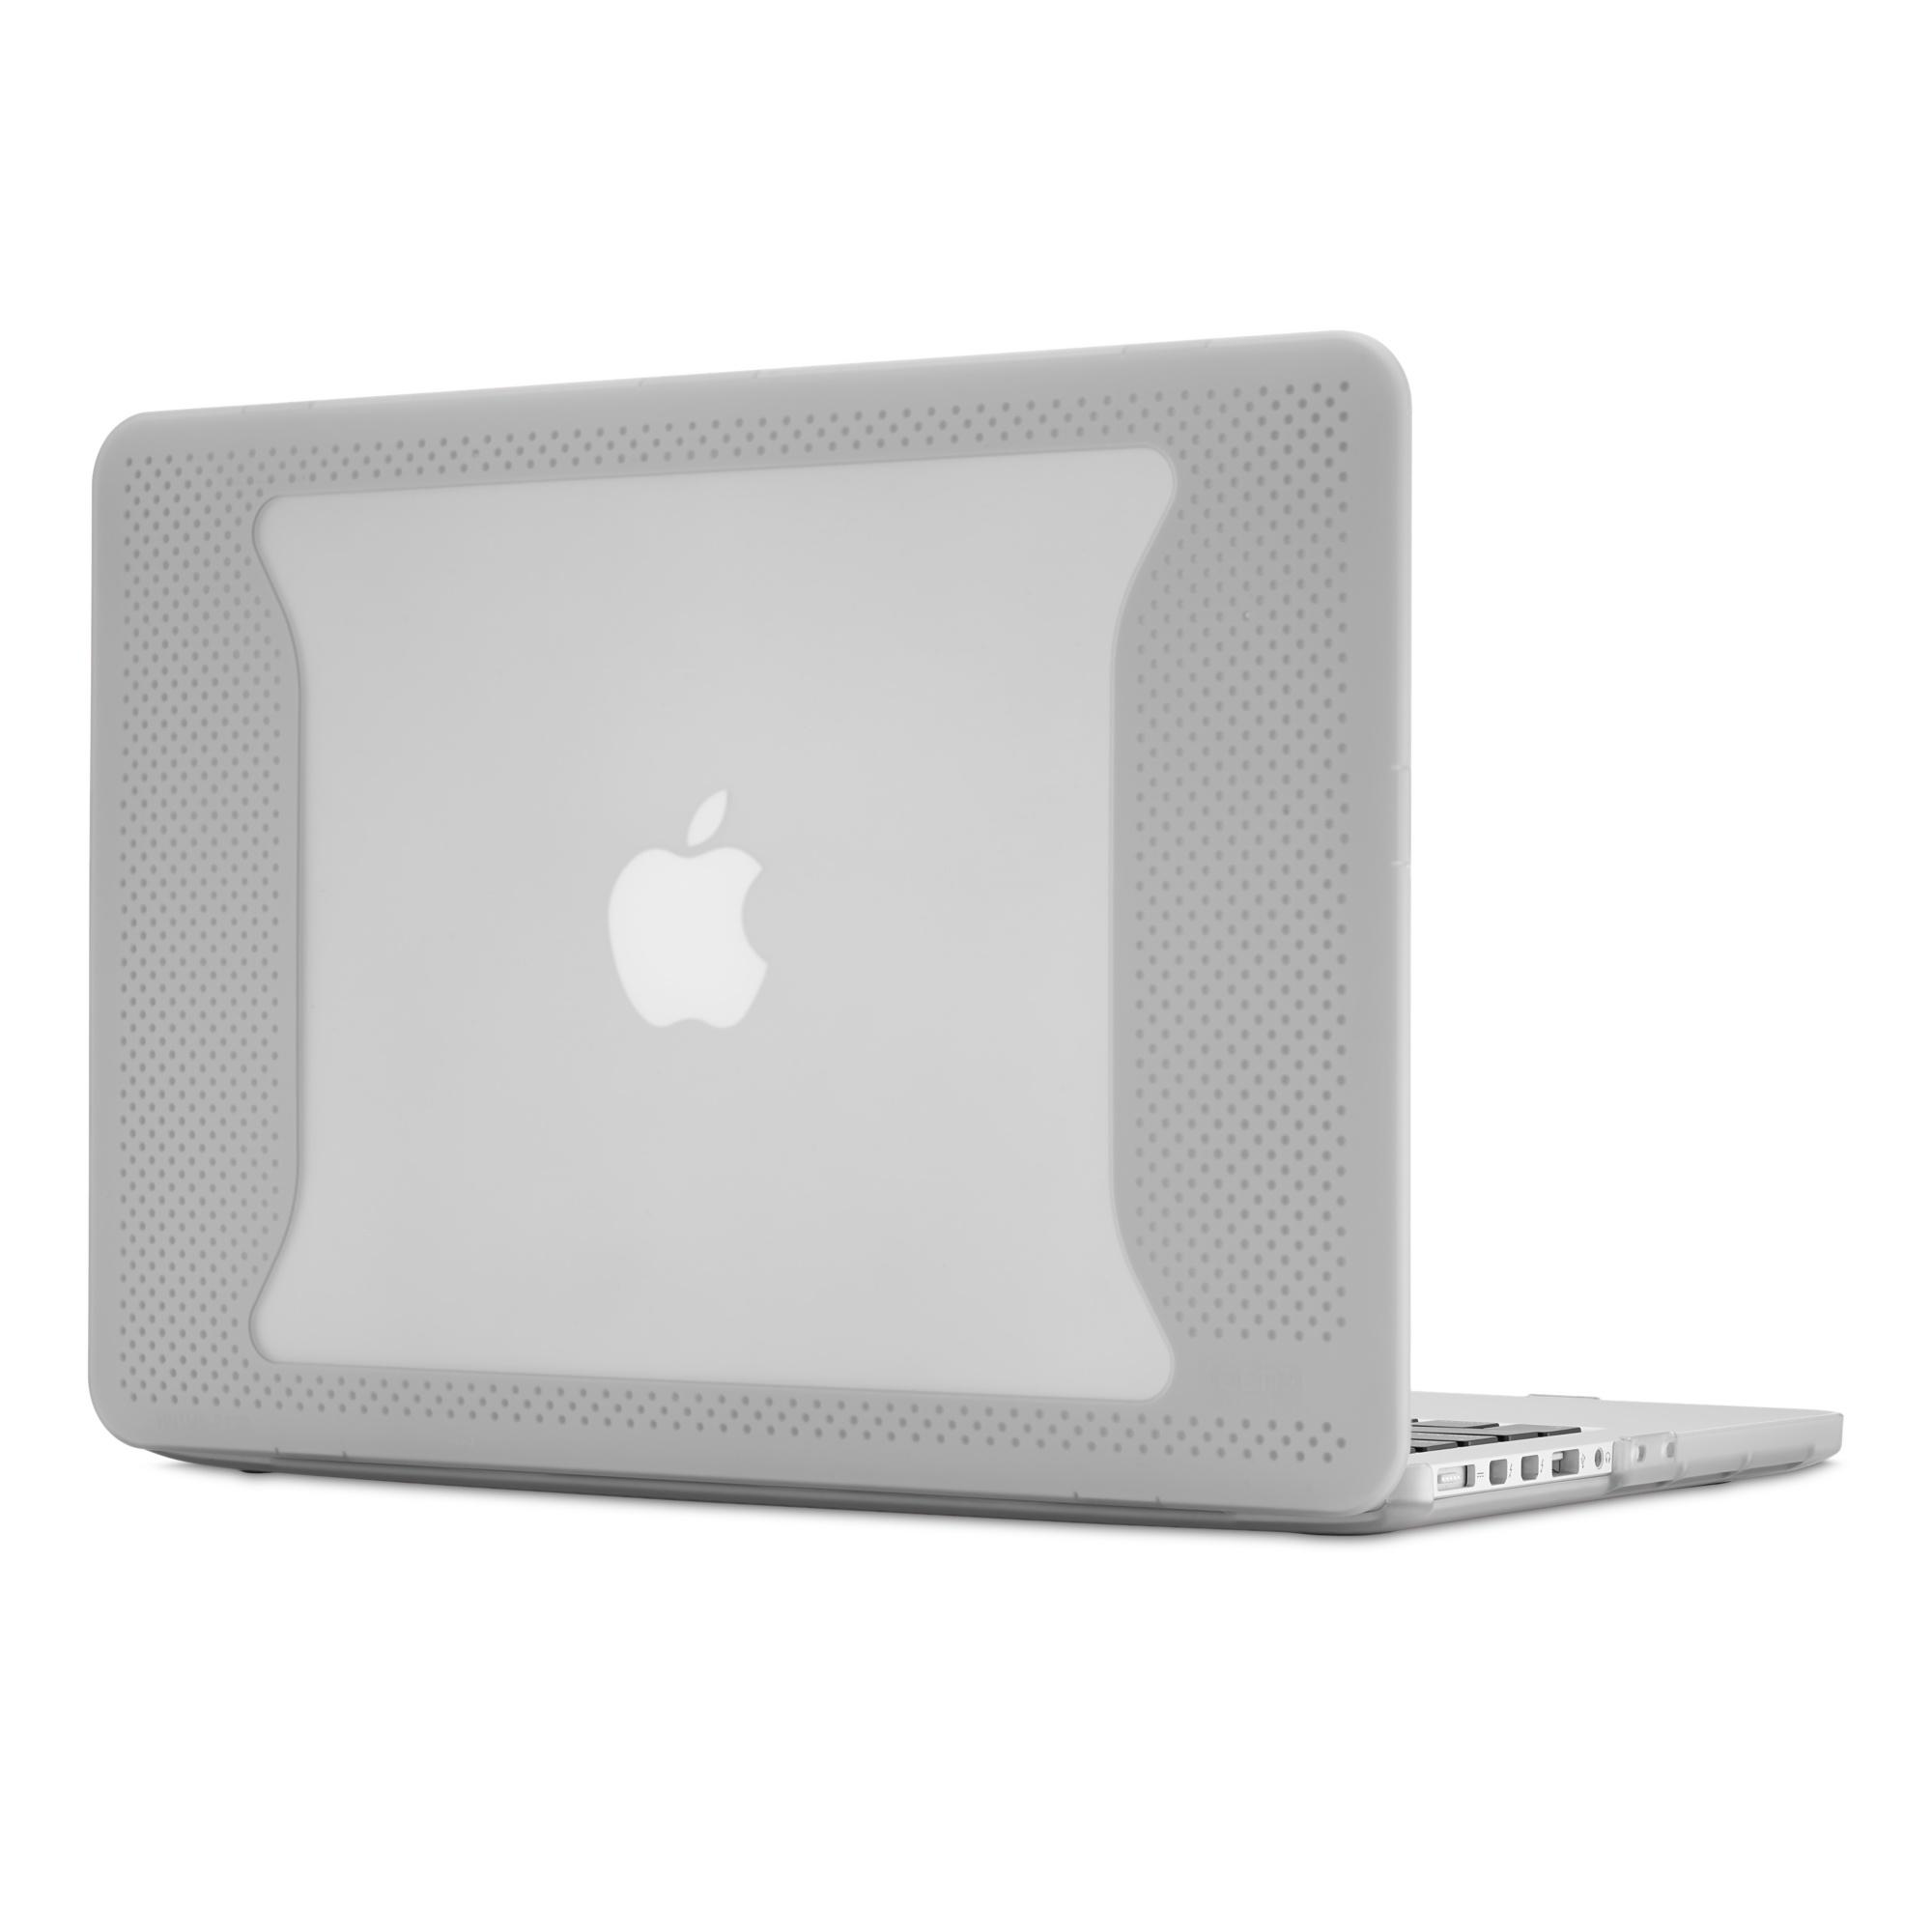 Odolné pouzdro / kryt na MacBook Pro Retina 13 - Tech21, Impact Snap